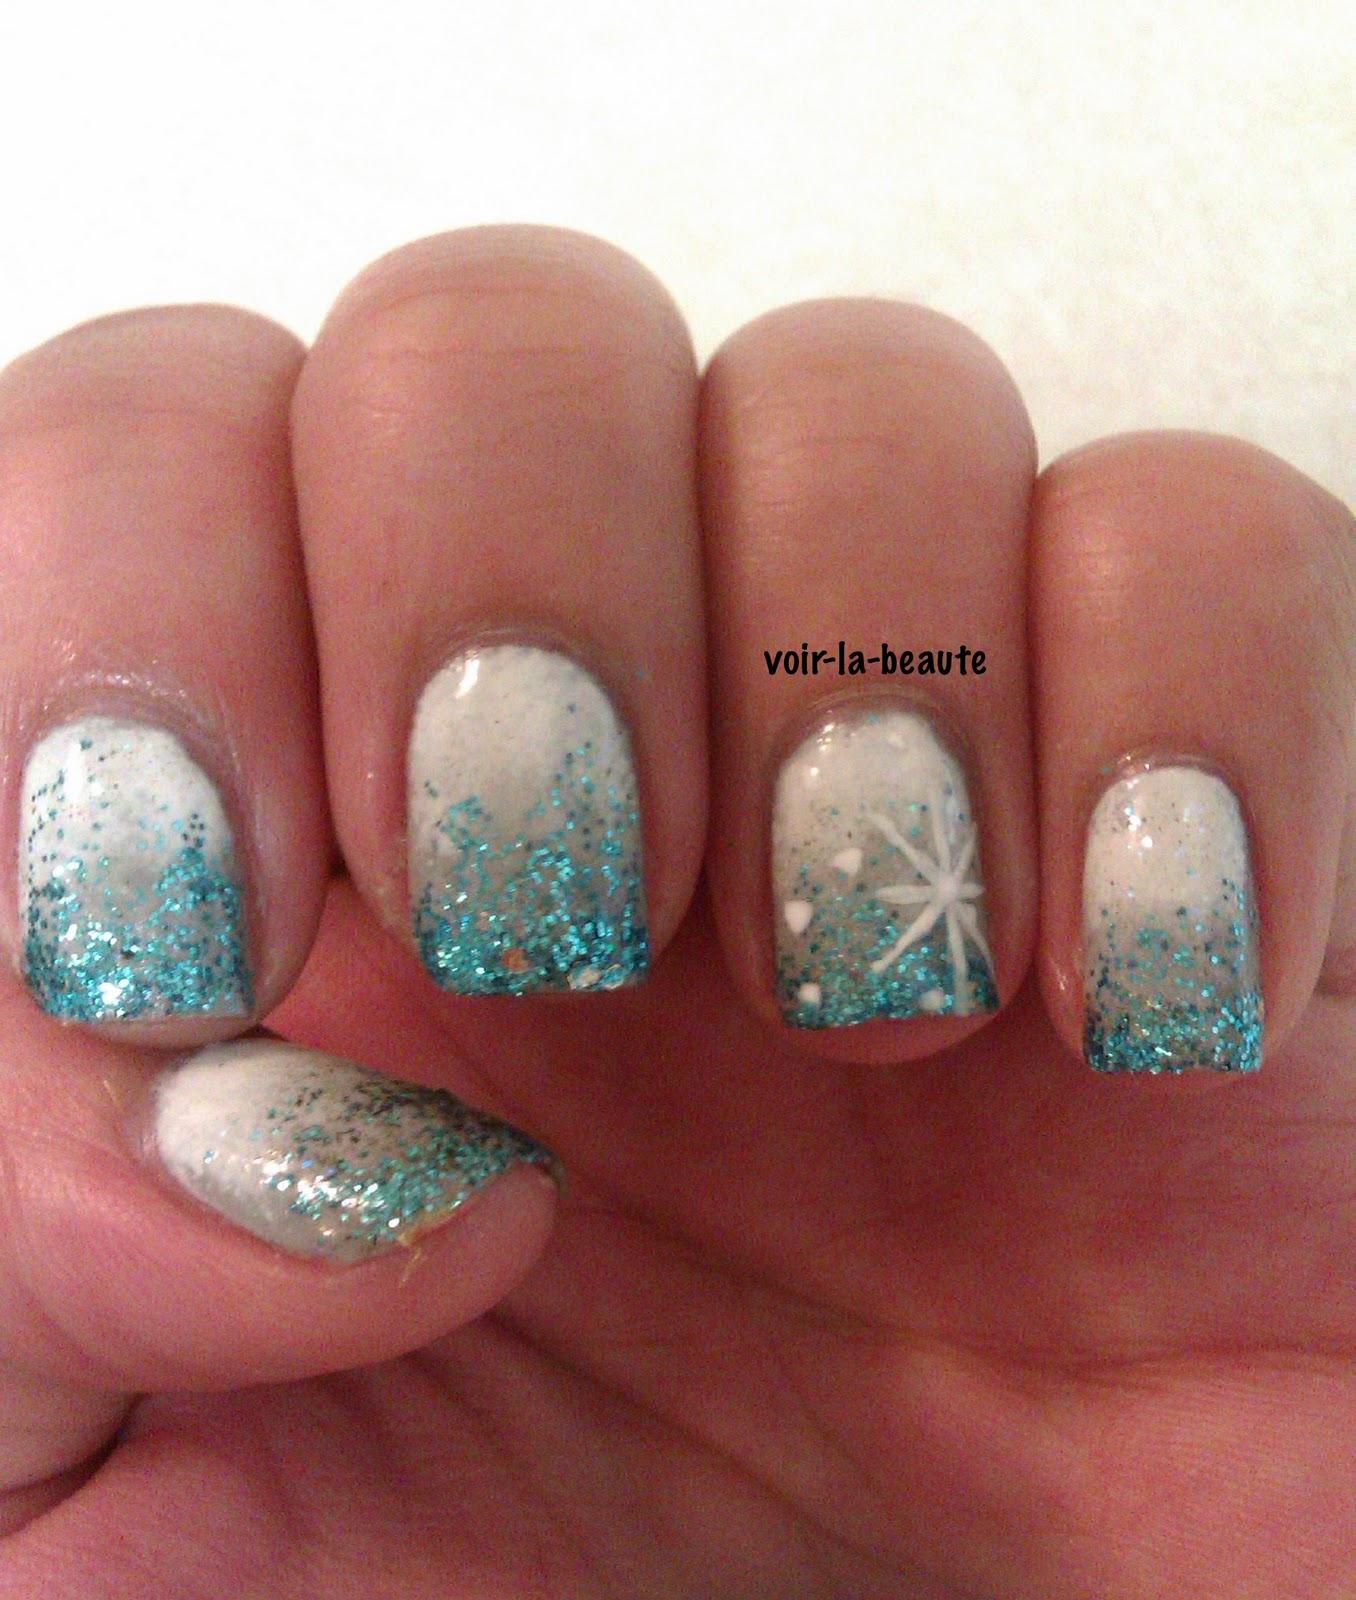 Polish Love: Snow Nails